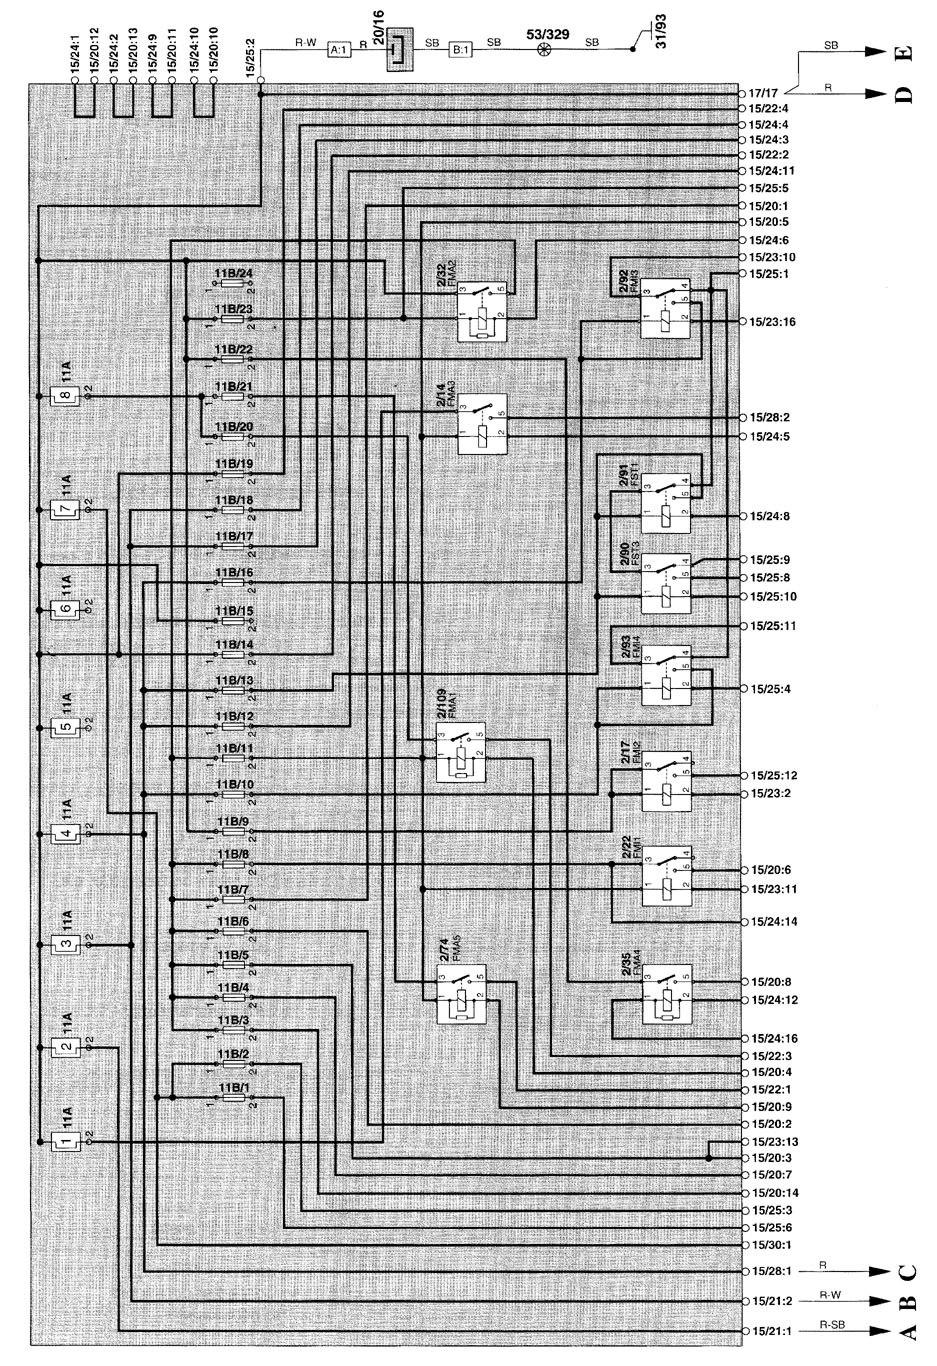 medium resolution of wrg 2586 2002 oldsmobile bravada engine diagram2002 oldsmobile bravada engine diagram 9